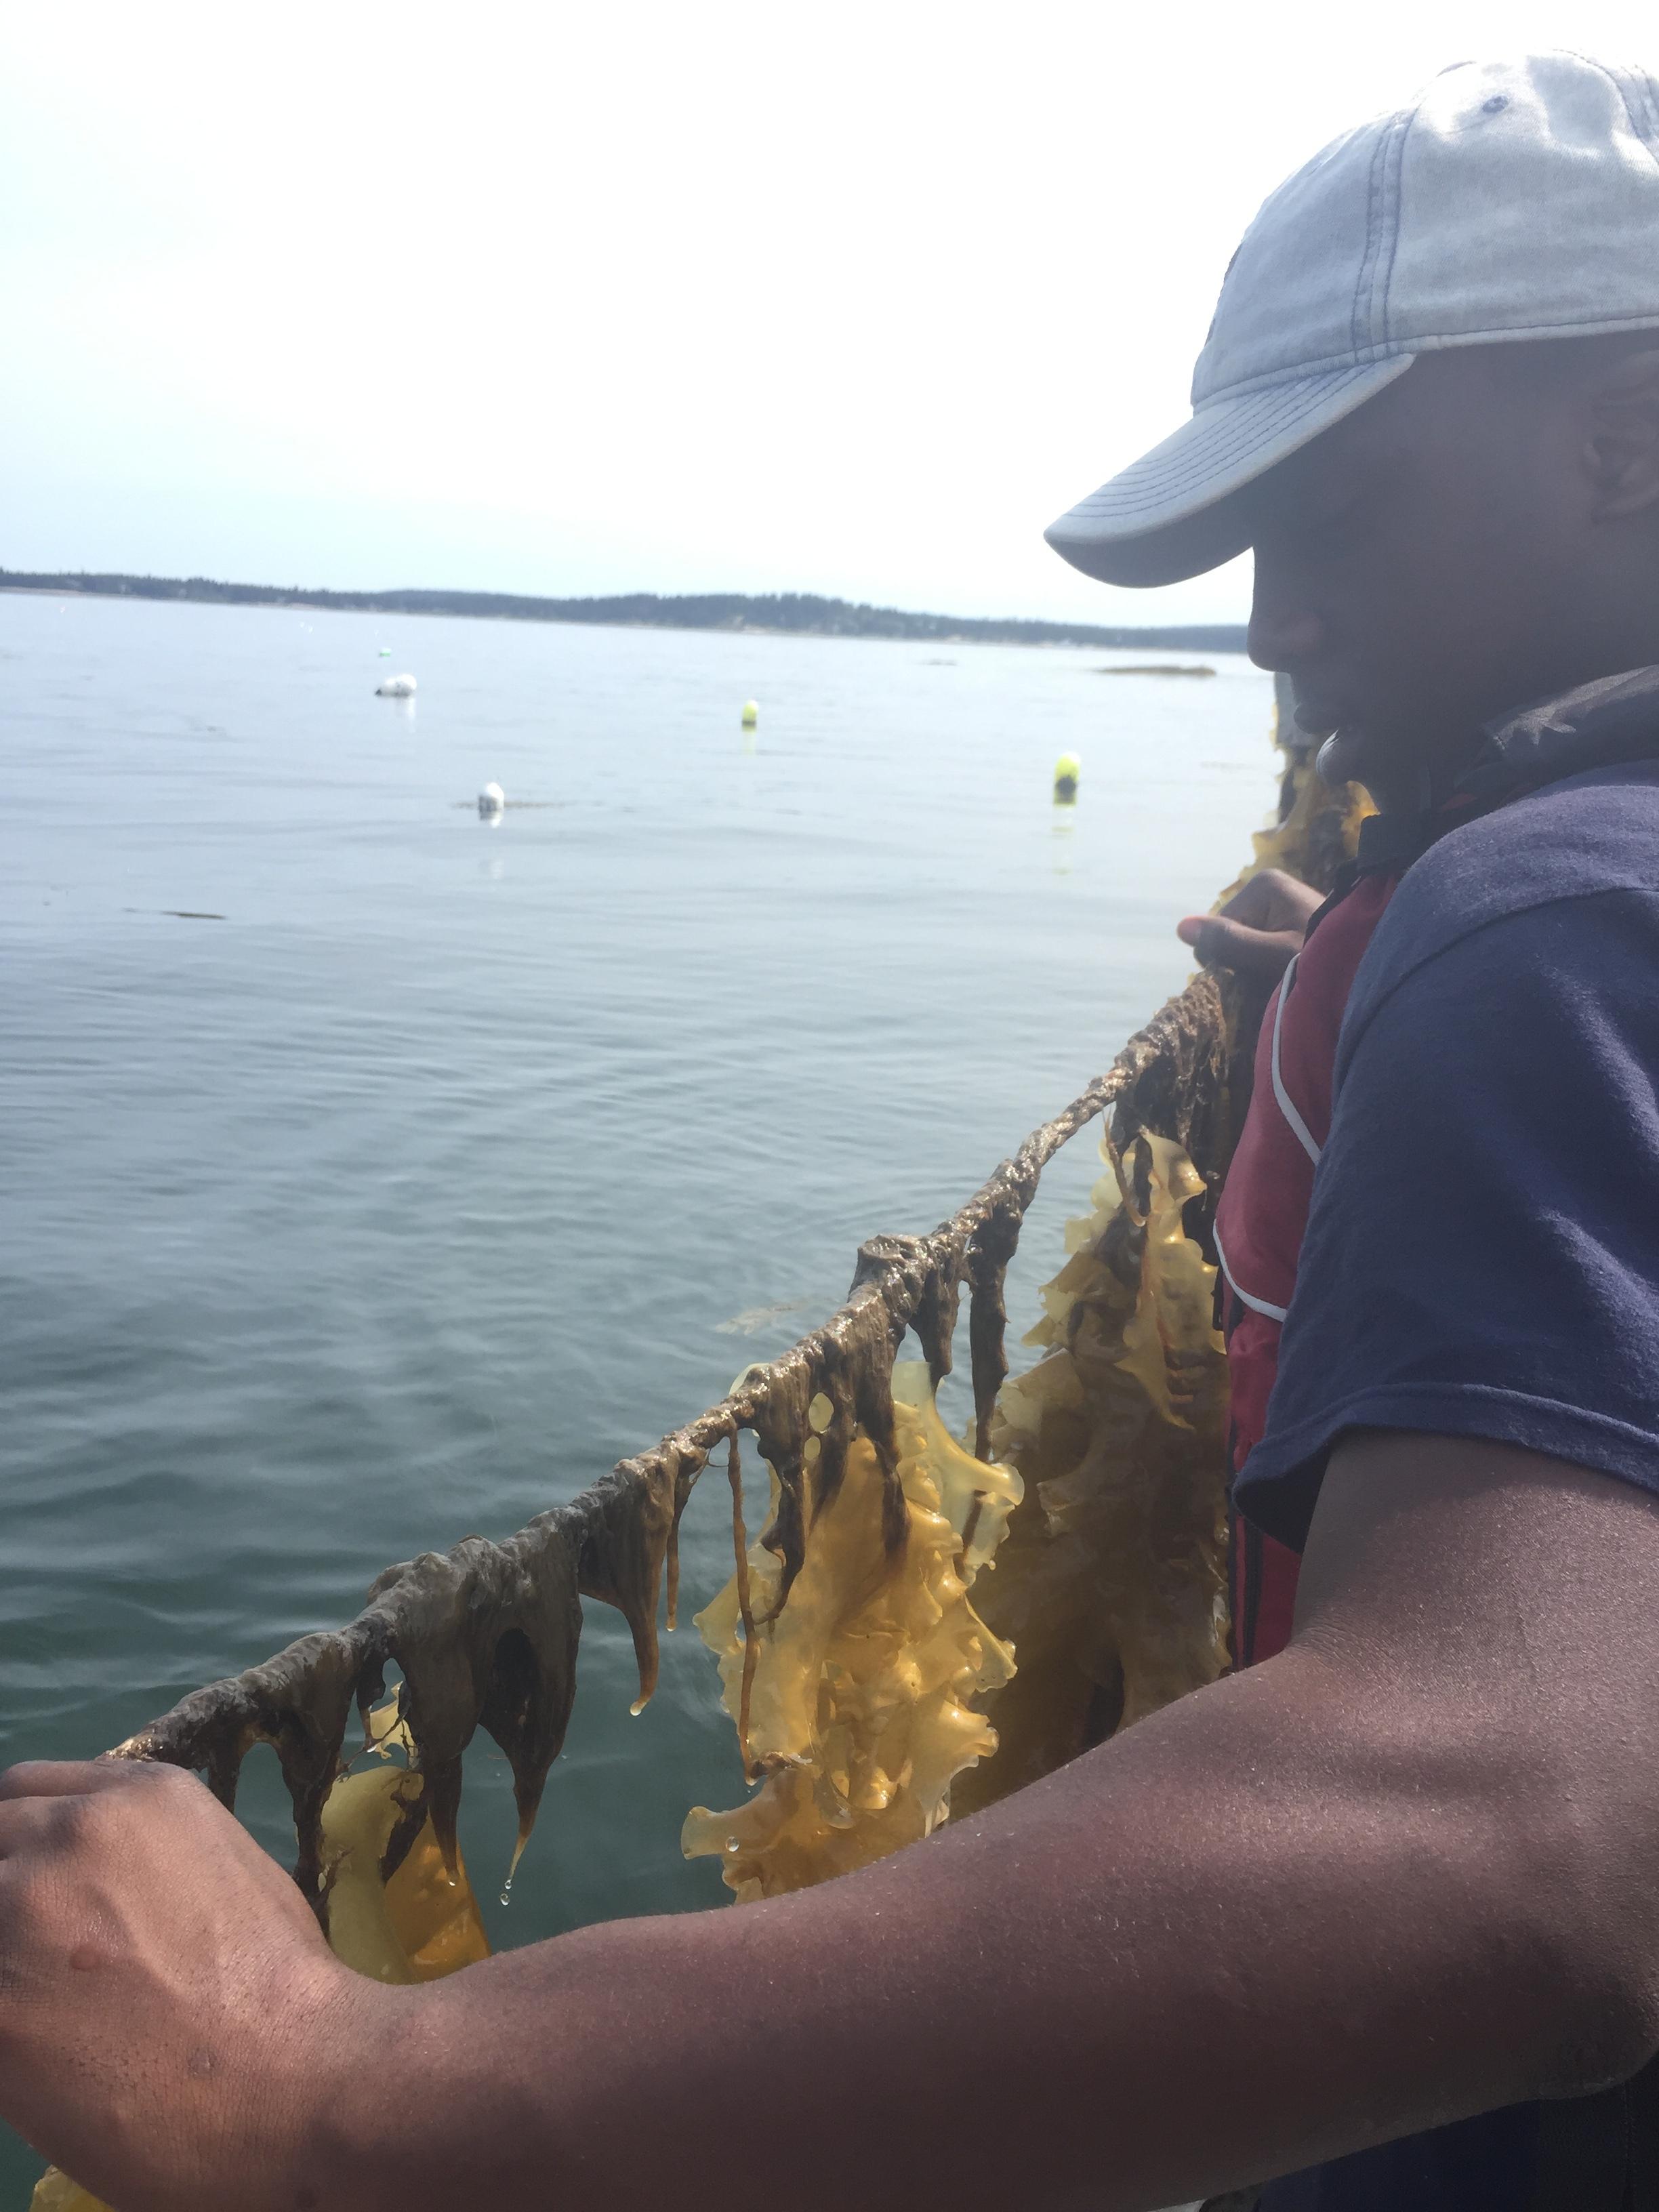 Poking around the Aquaculture's kelp line